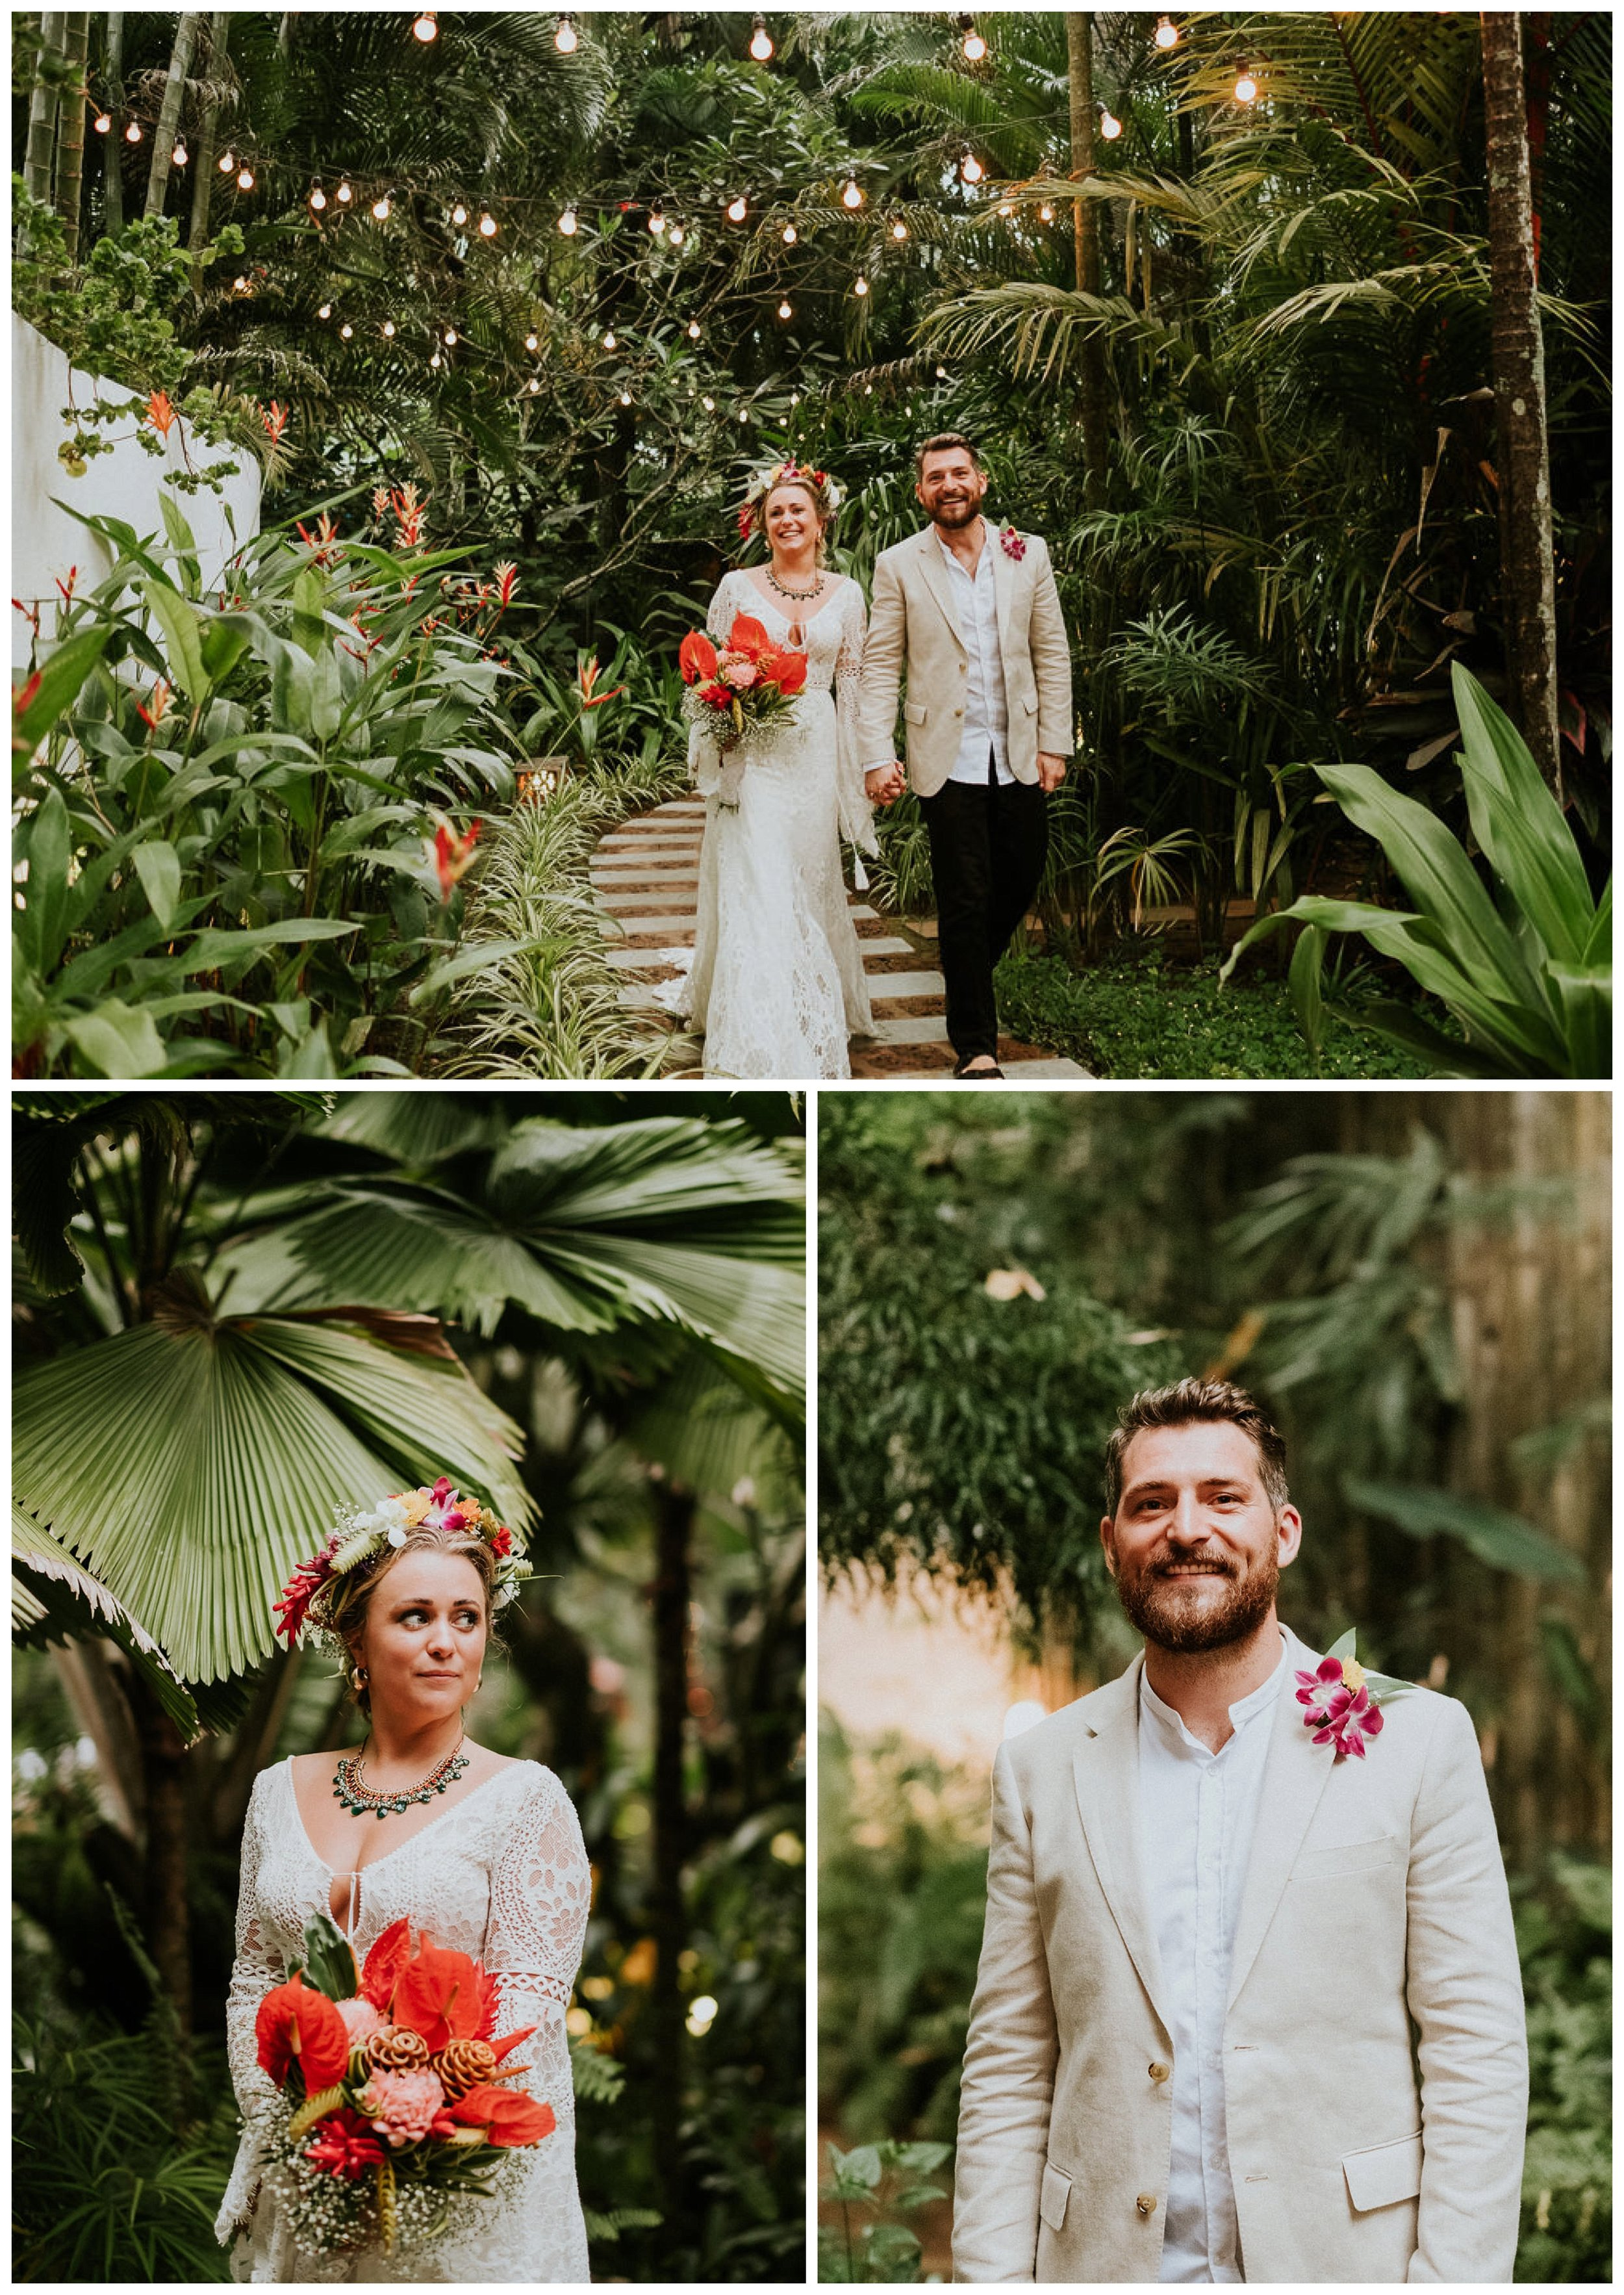 Goa Destination Wedding Photographer India Colouful Fun Joanna Nicole Photography Coco Shambhala18.jpg